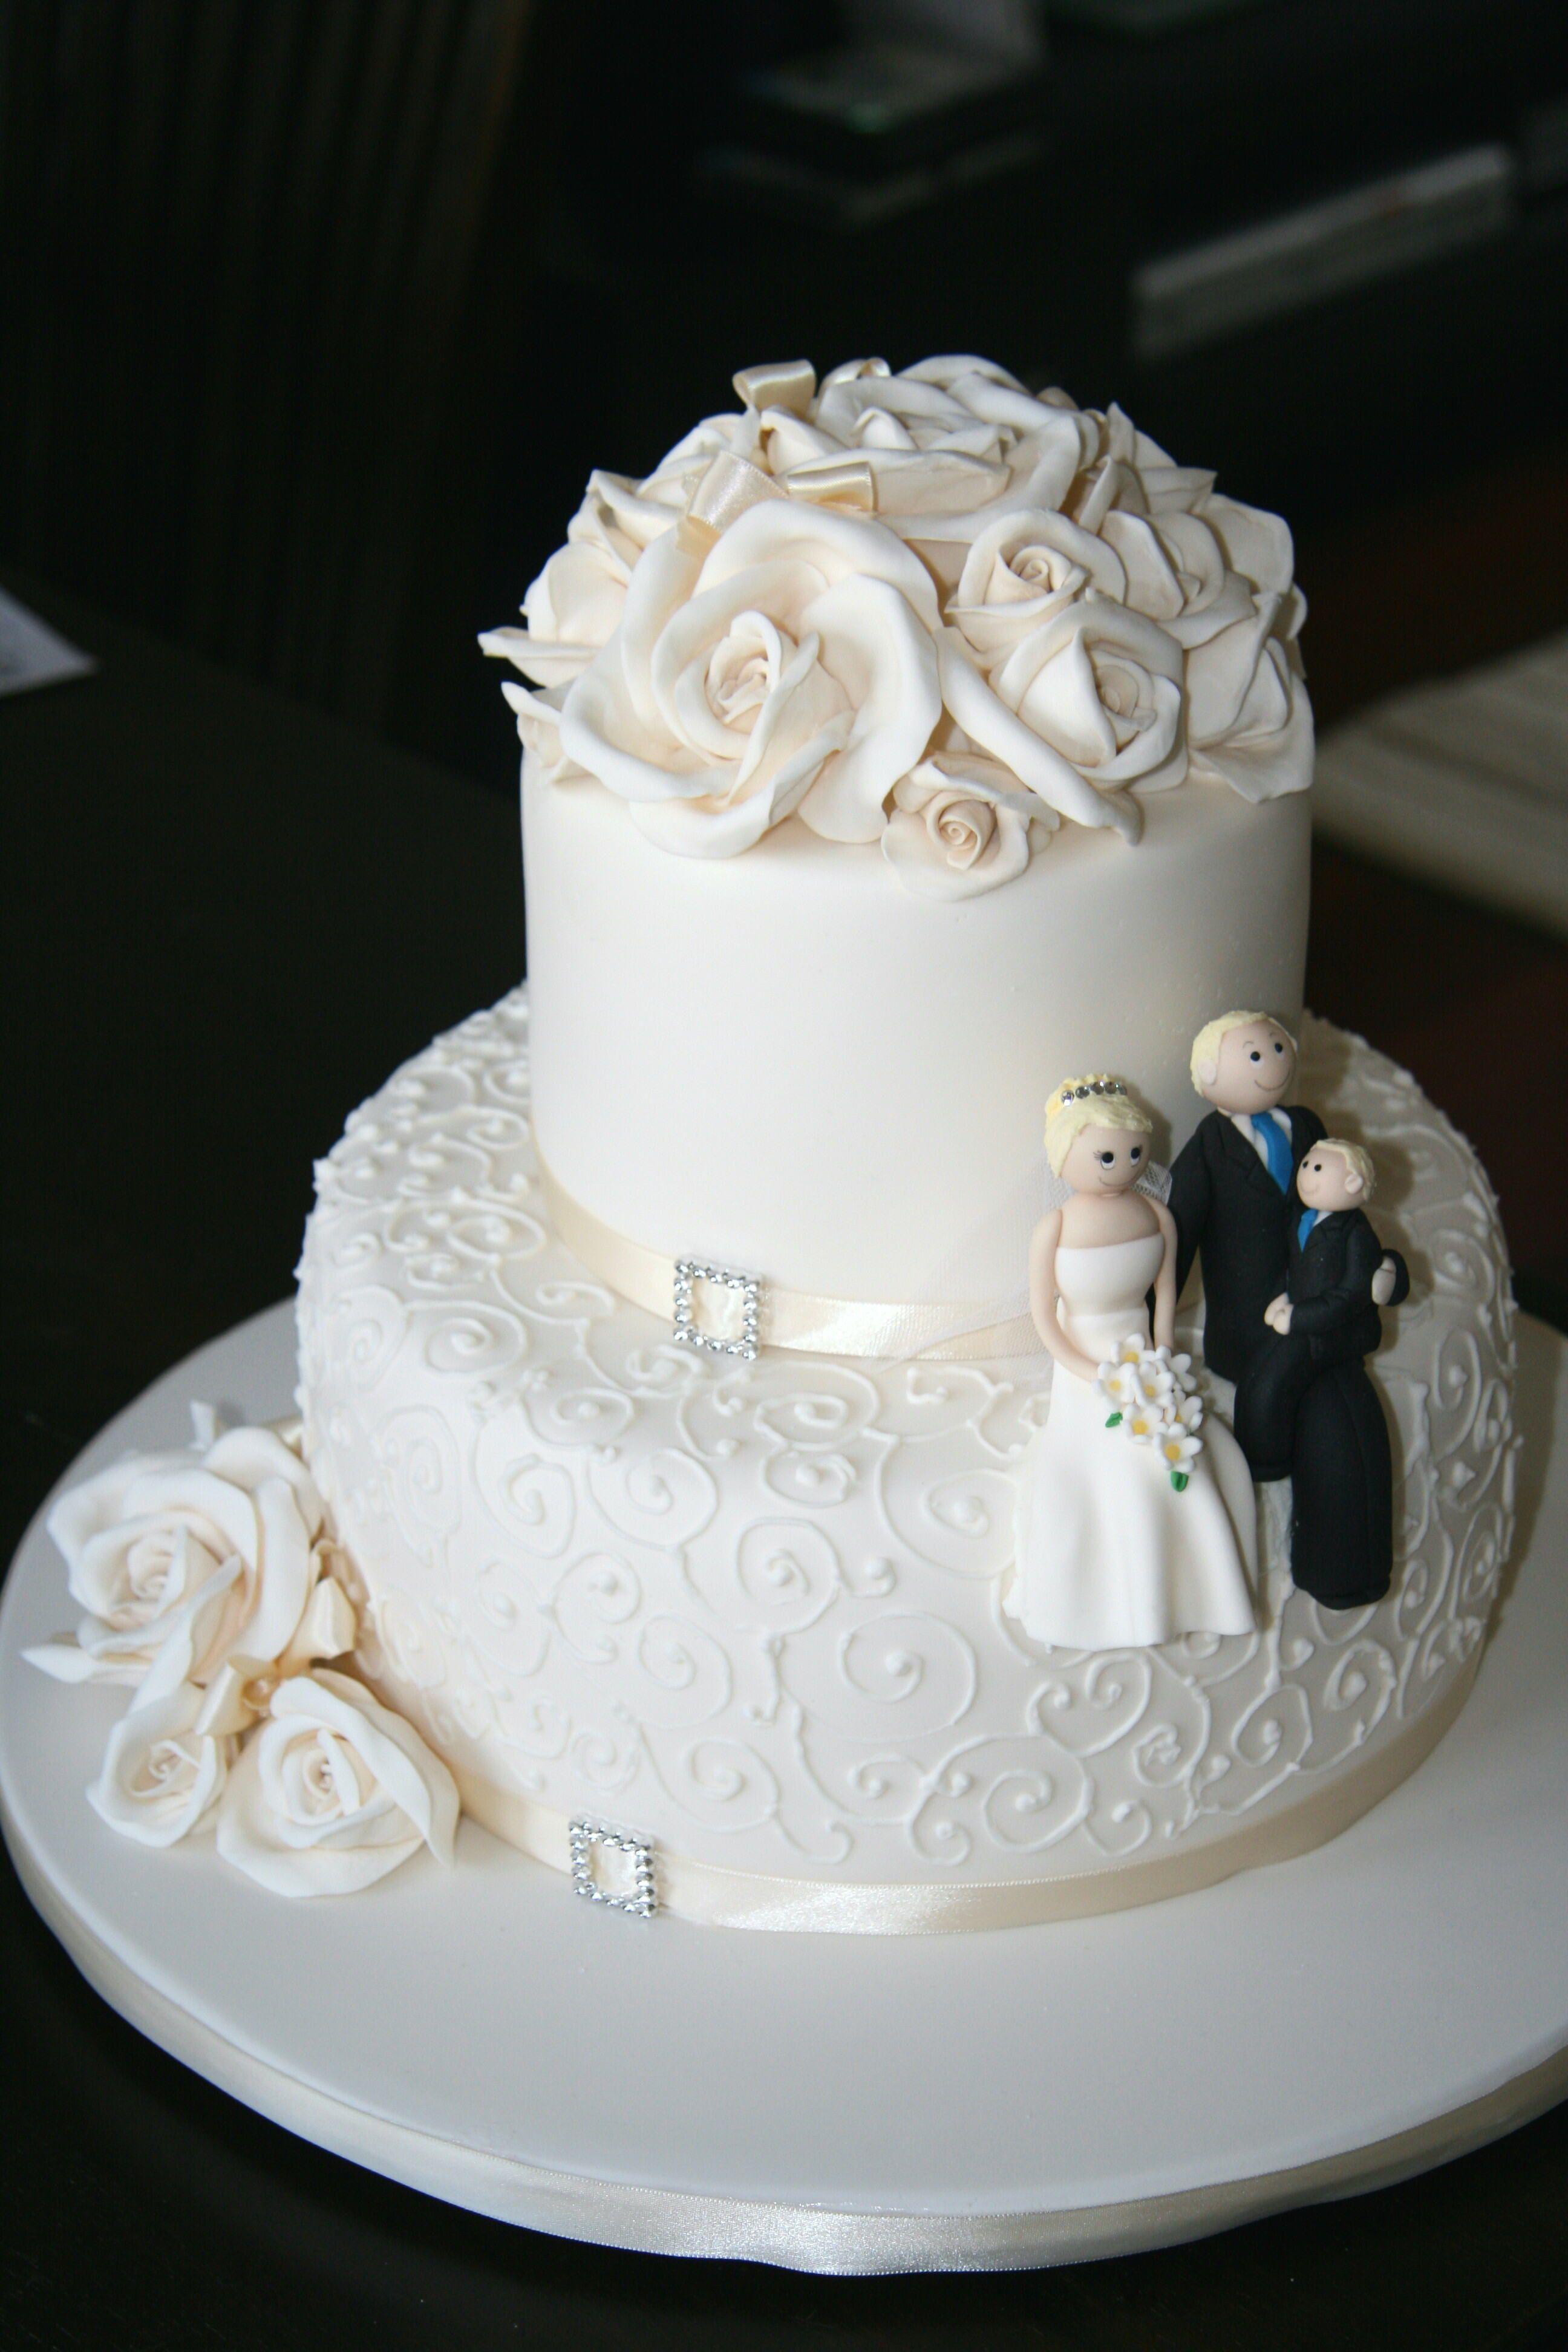 Wedding Cake 2 Tiers Bolo De Casamento Bolos Decorados Bolo